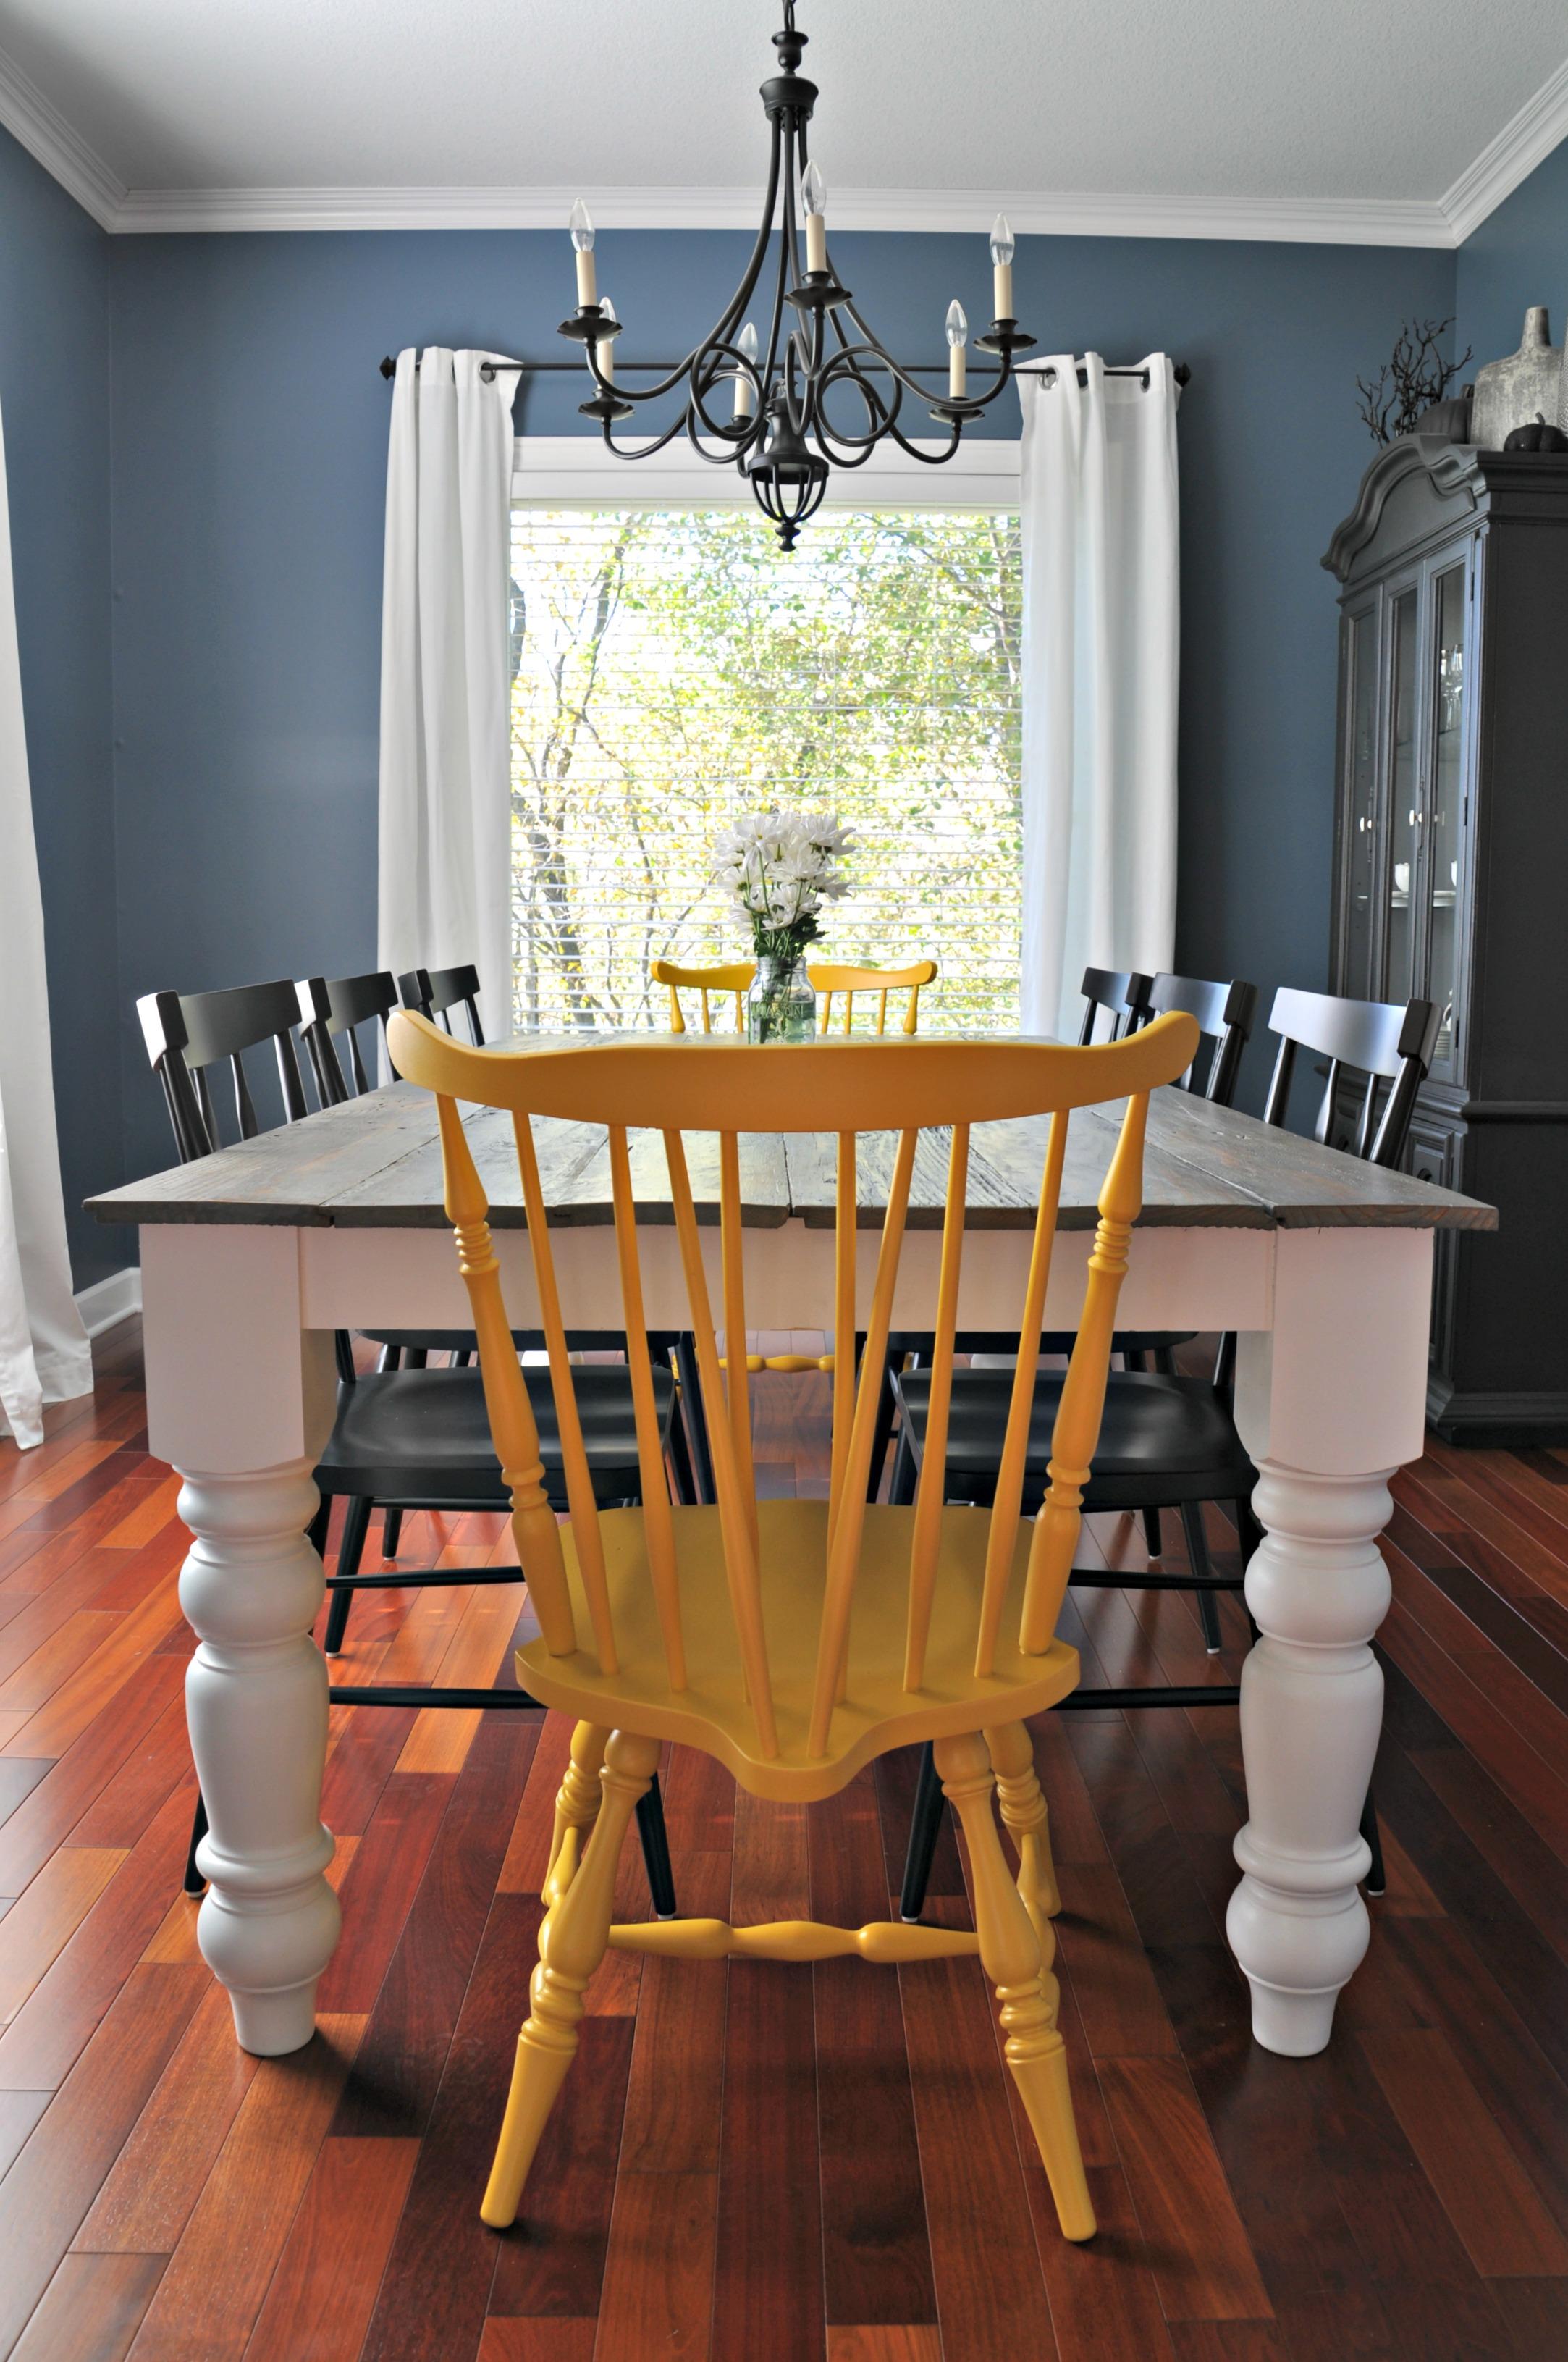 how to build a farmhouse table diy tutorial diy kitchen table plans Free Farmhouse Dining Table Plans